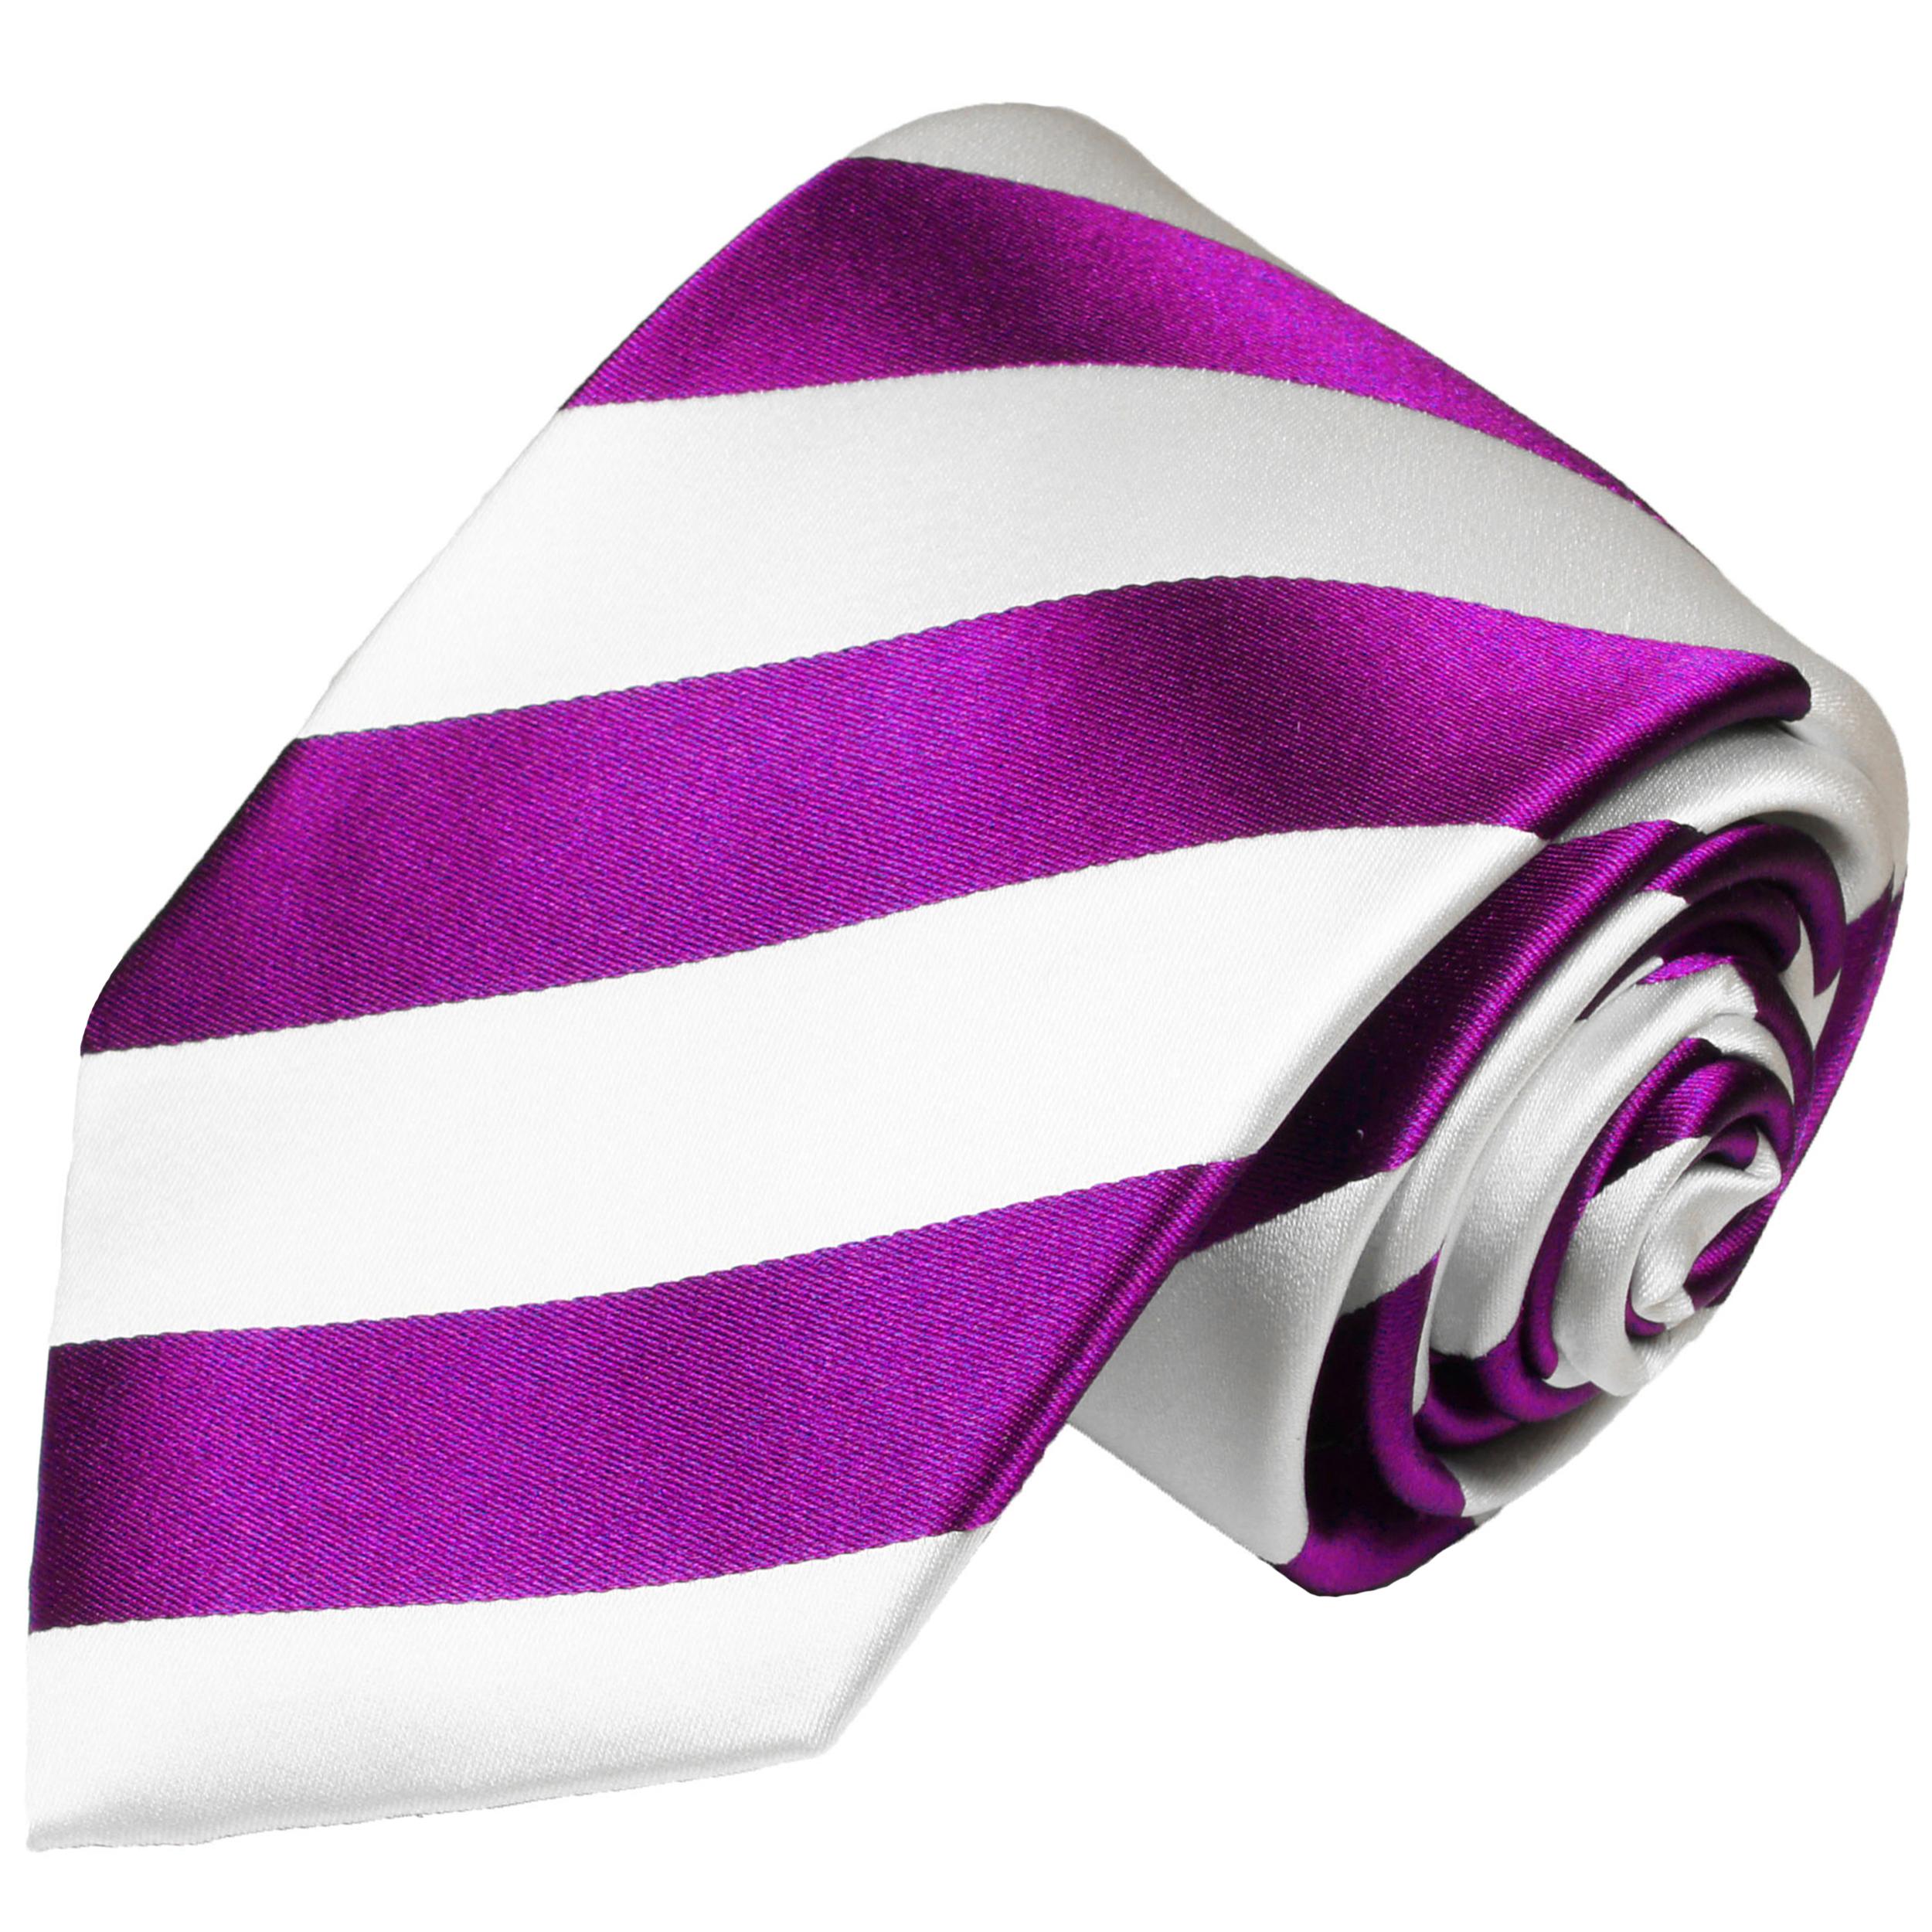 krawatte pink gestreift 451 jetzt bestellen paul malone shop. Black Bedroom Furniture Sets. Home Design Ideas